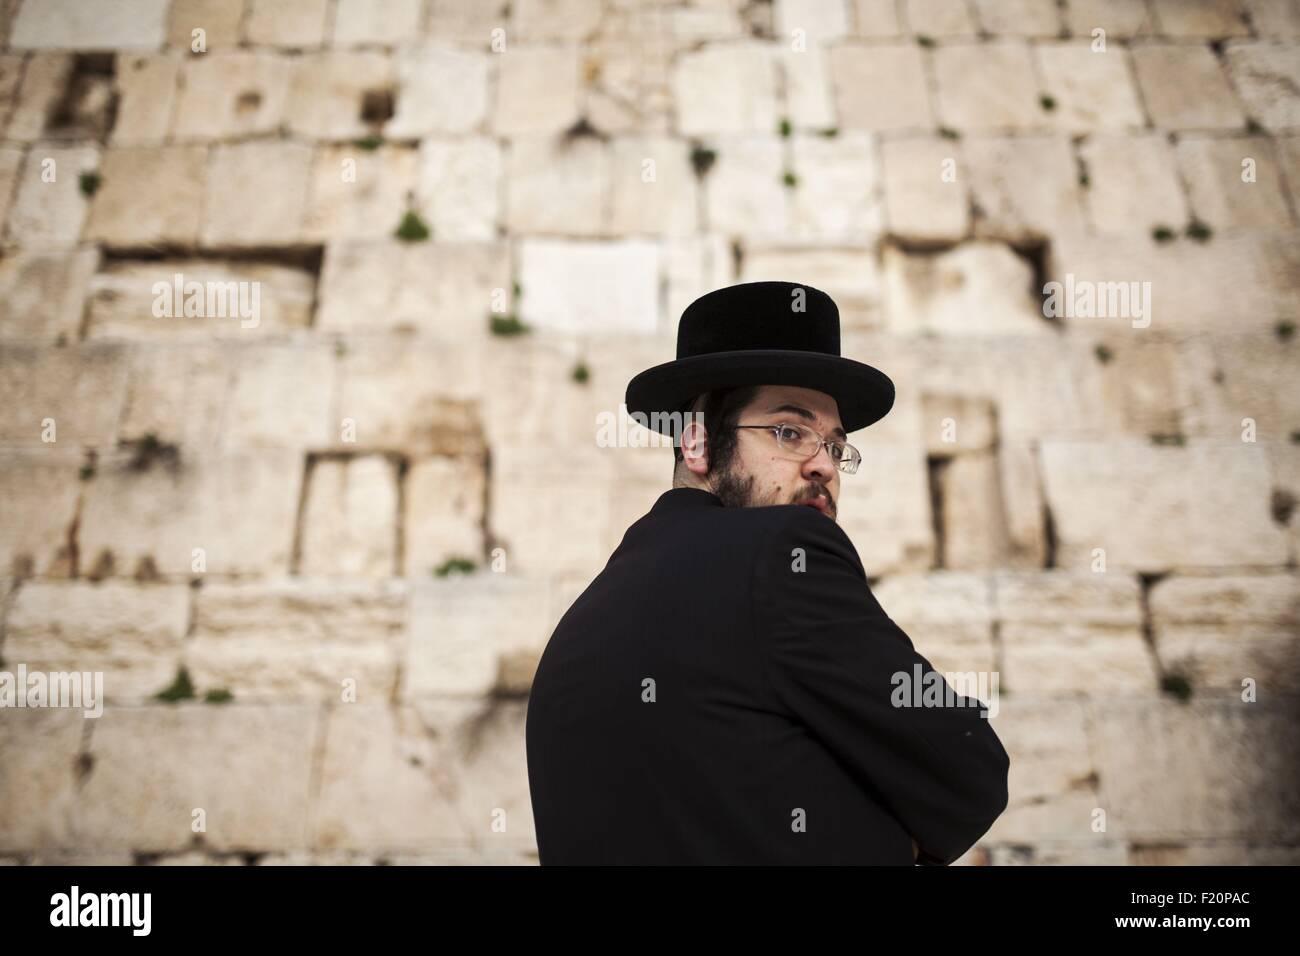 Israel, Jerusalem, Orthodox jew praying at the Wailing Wall - Stock Image